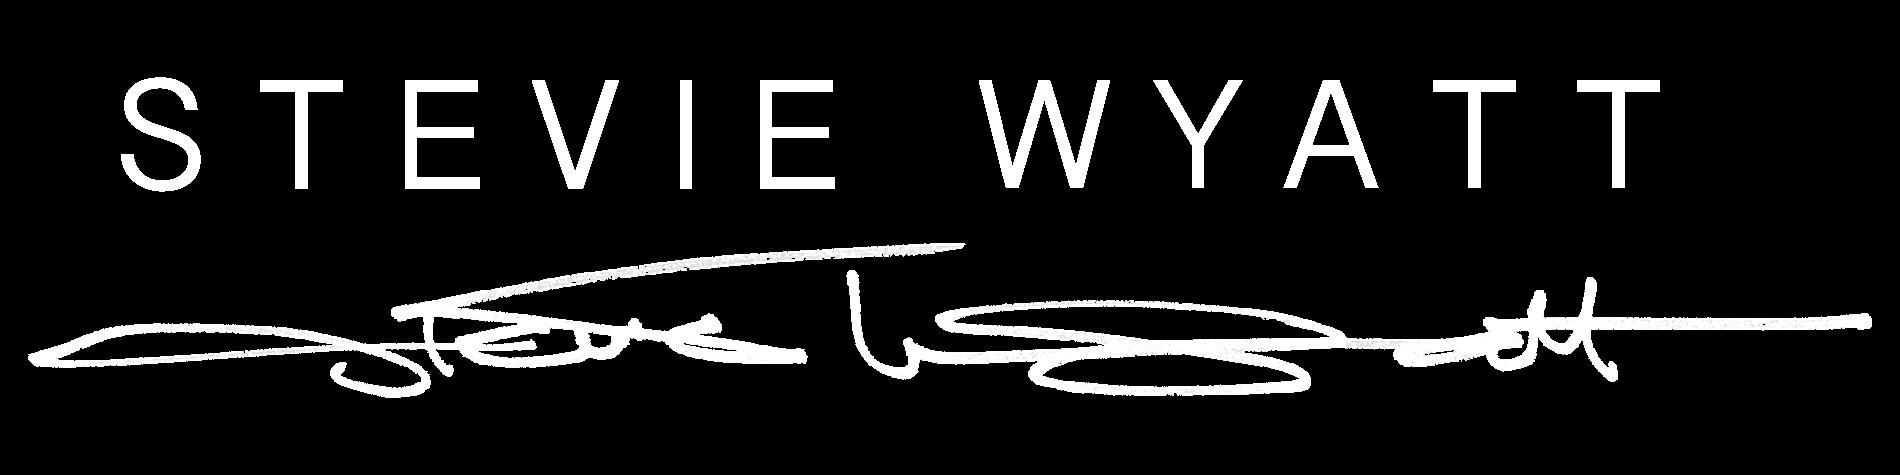 Stevie Wyatt